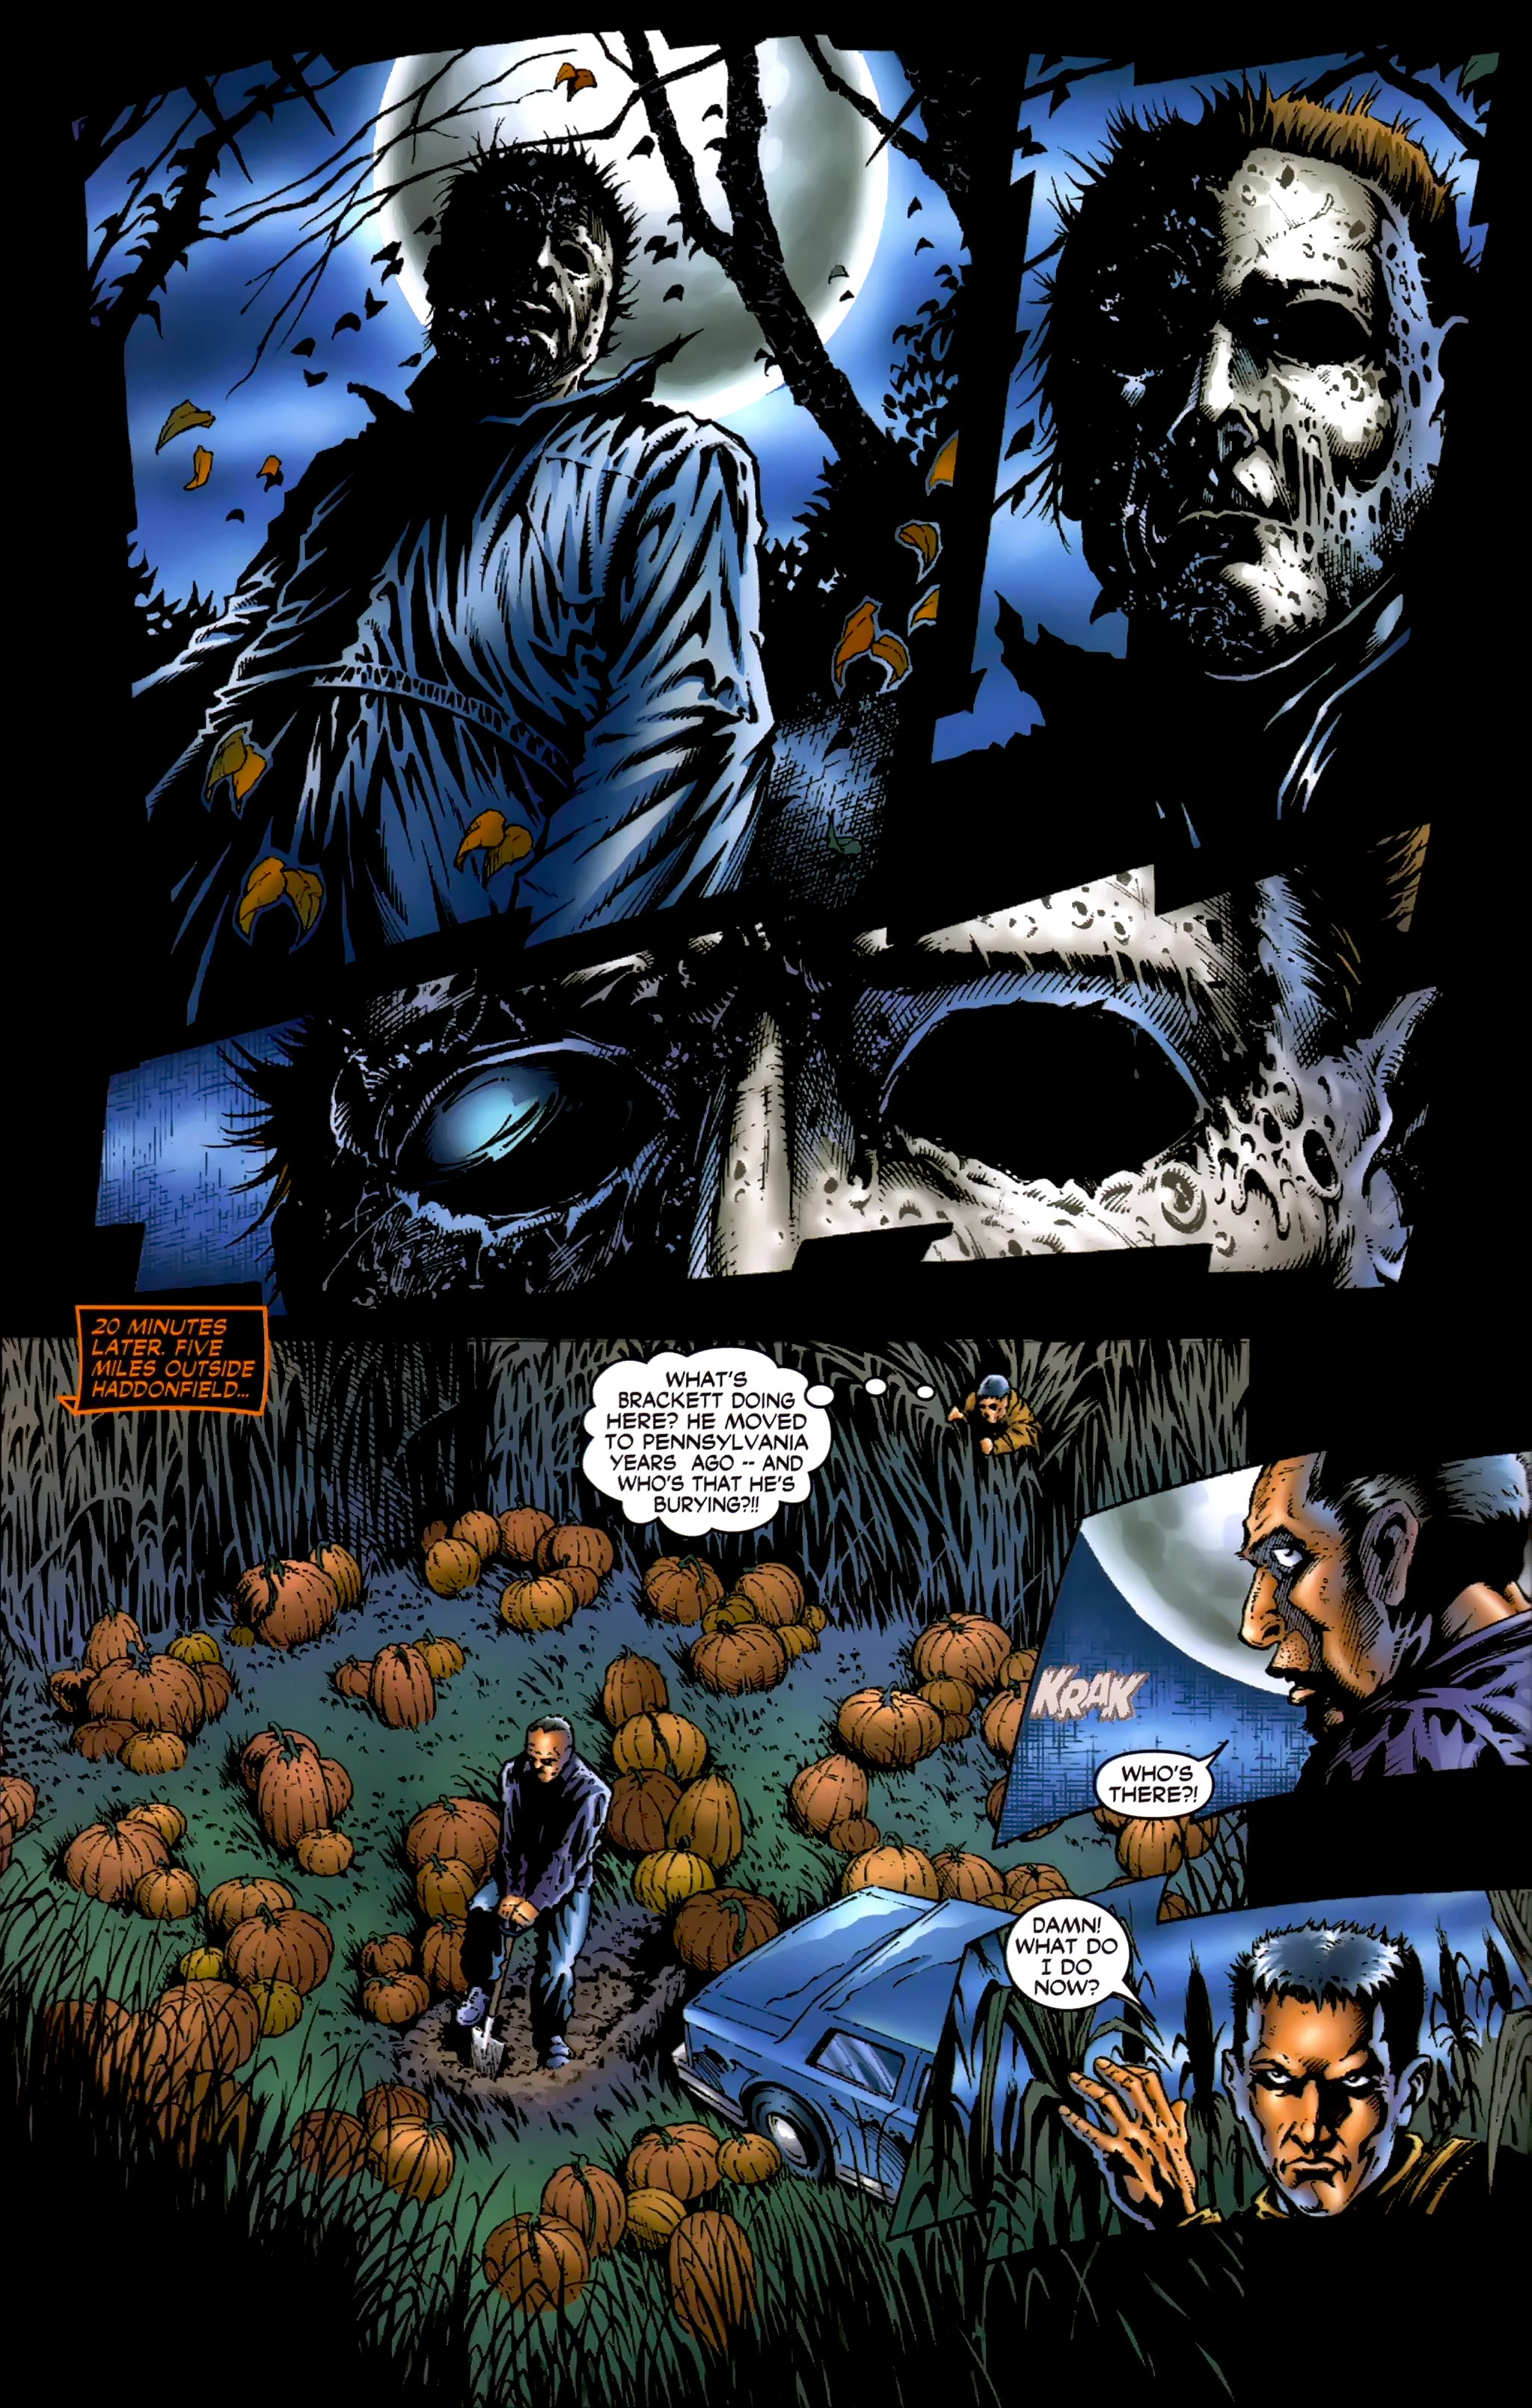 Read online Halloween II: The Blackest Eyes comic -  Issue # Full - 10